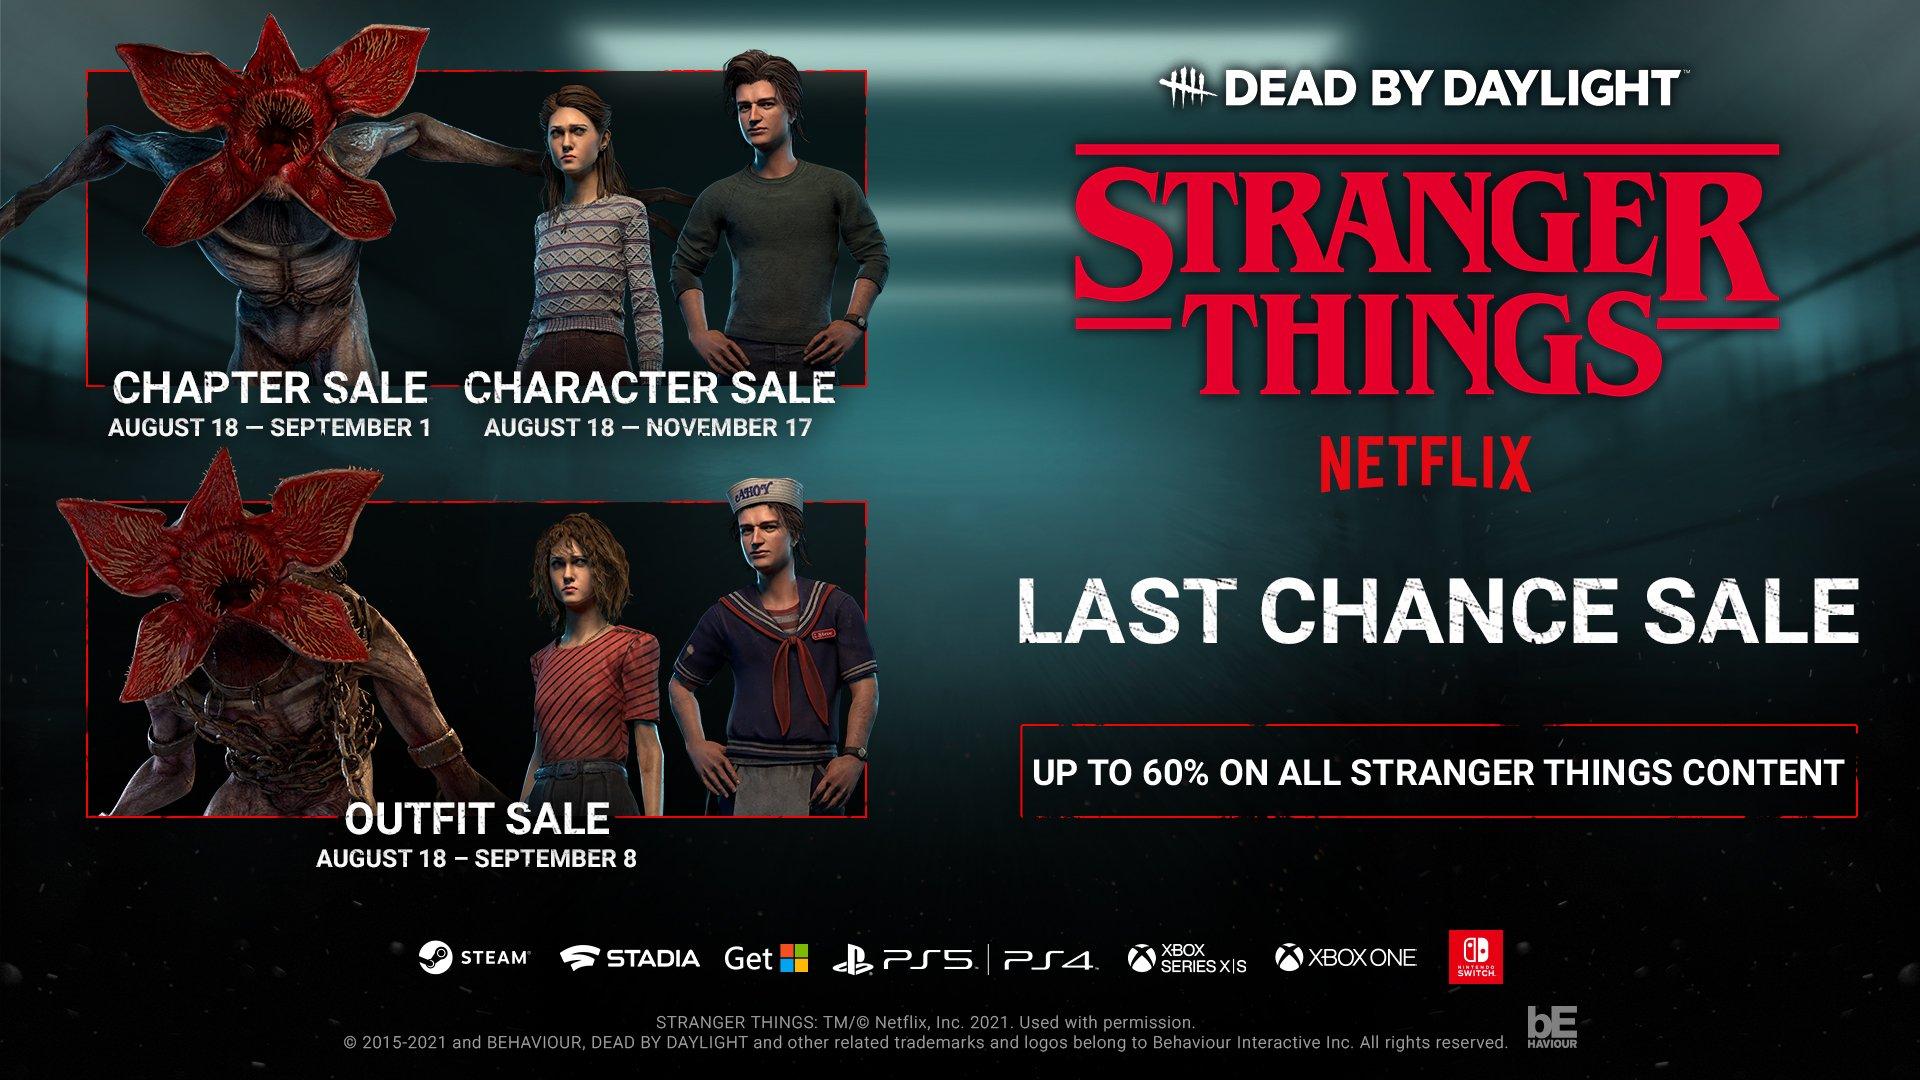 Dead by daylight stranger things last chance sale hellraiser